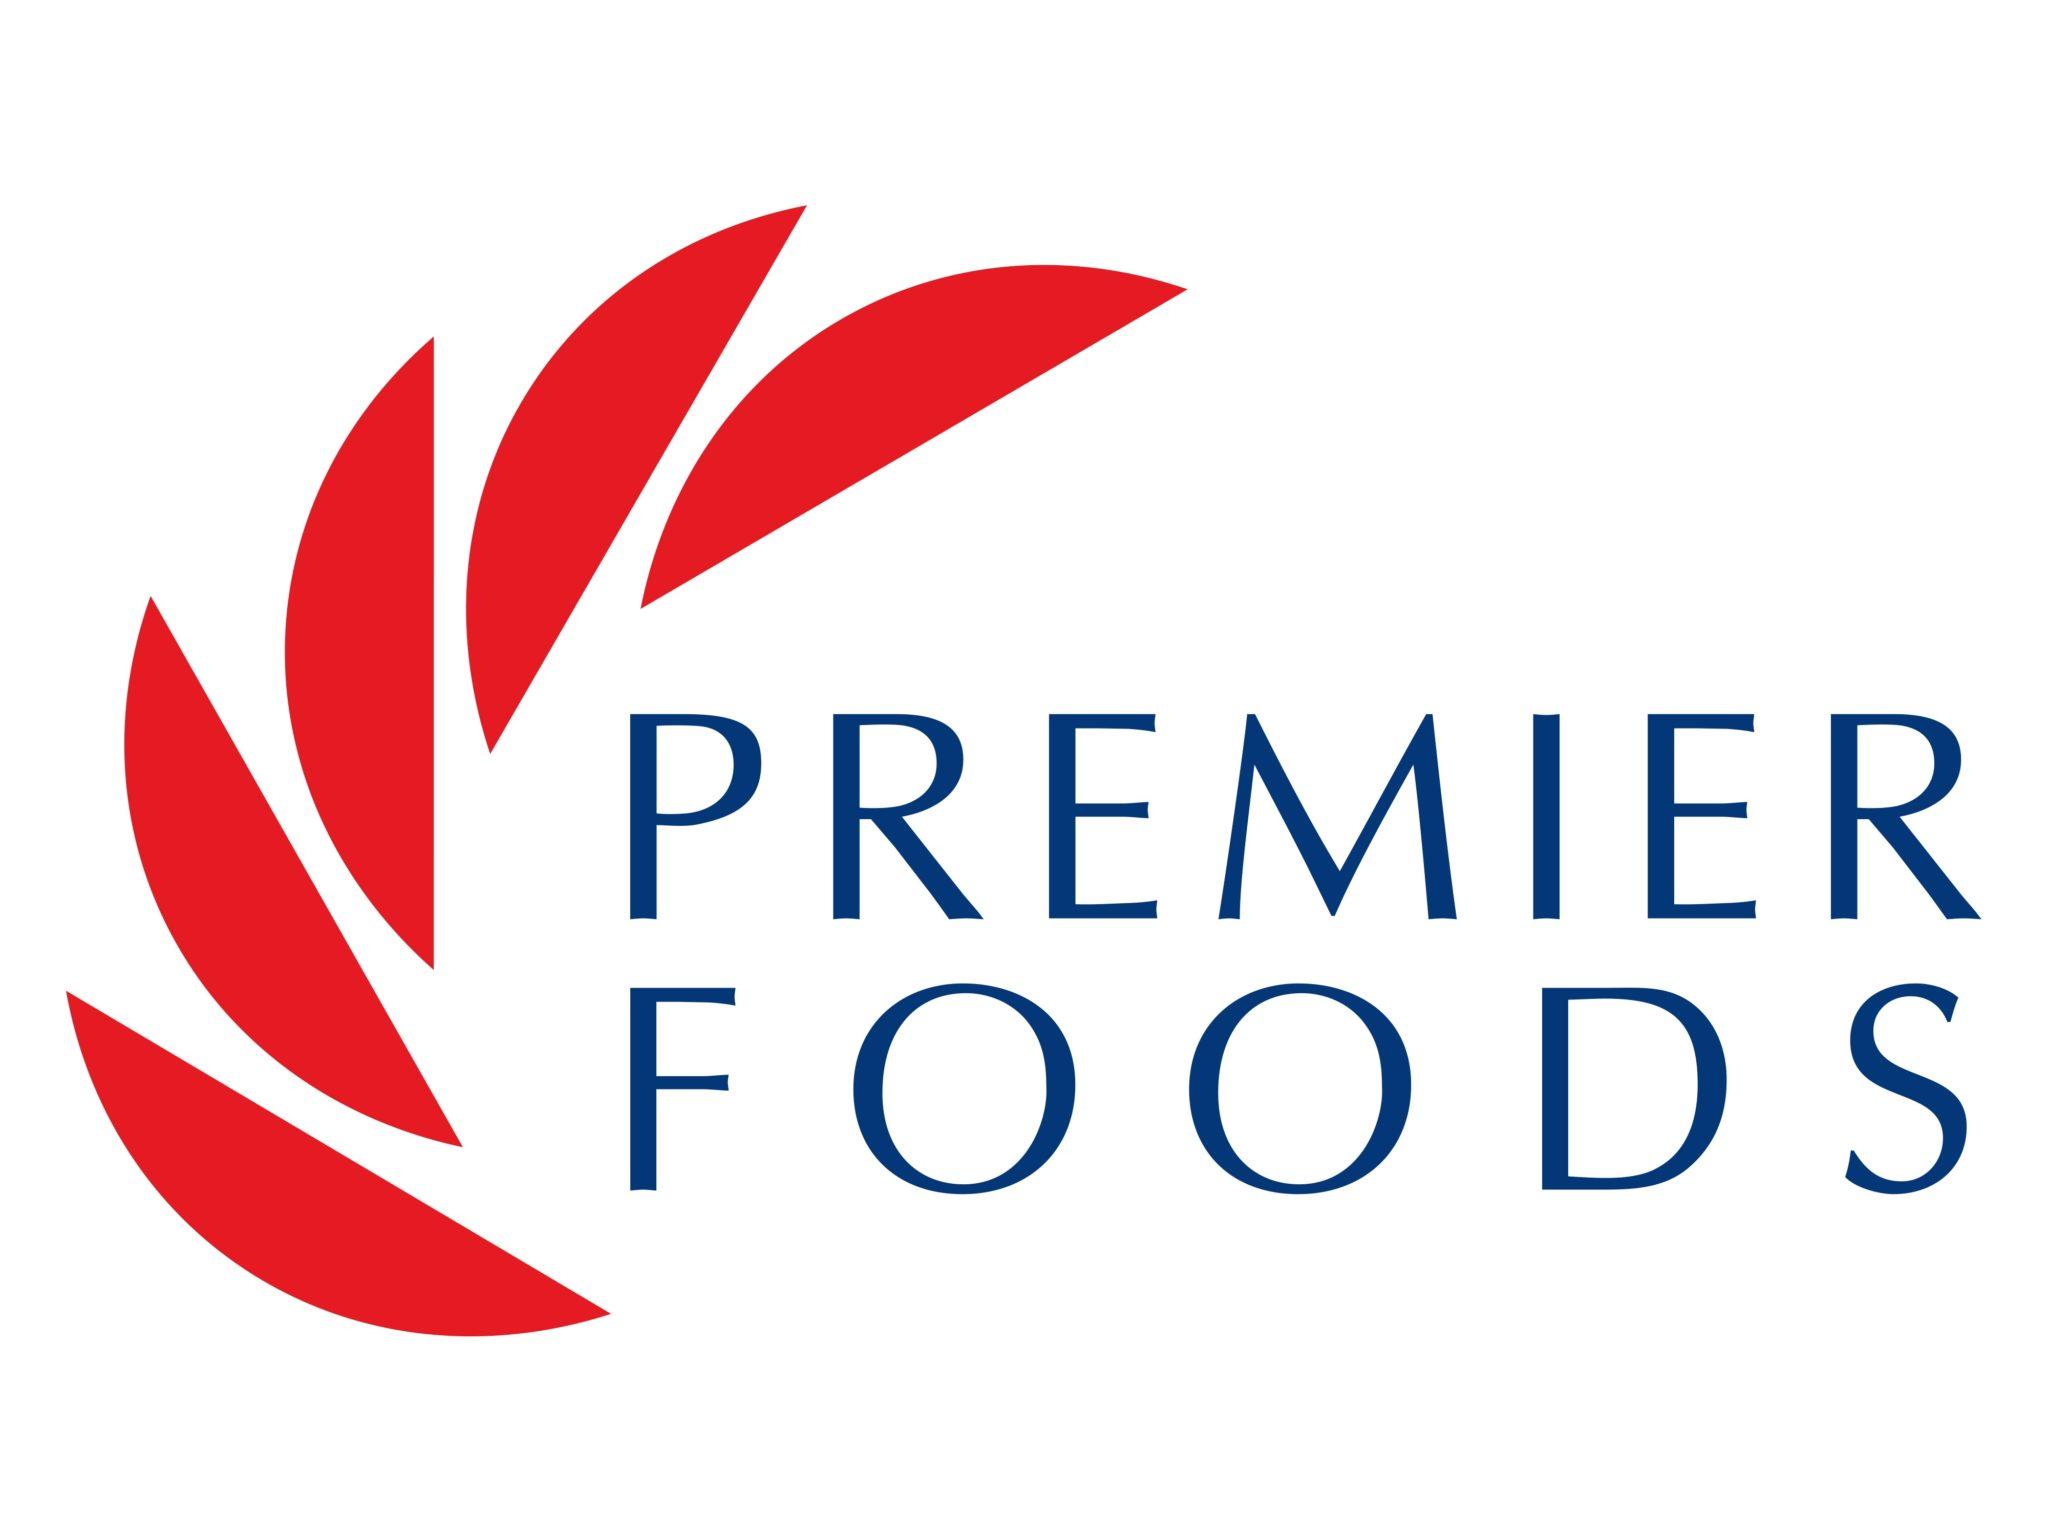 premierfoods_hires_logo_white_4000x3000